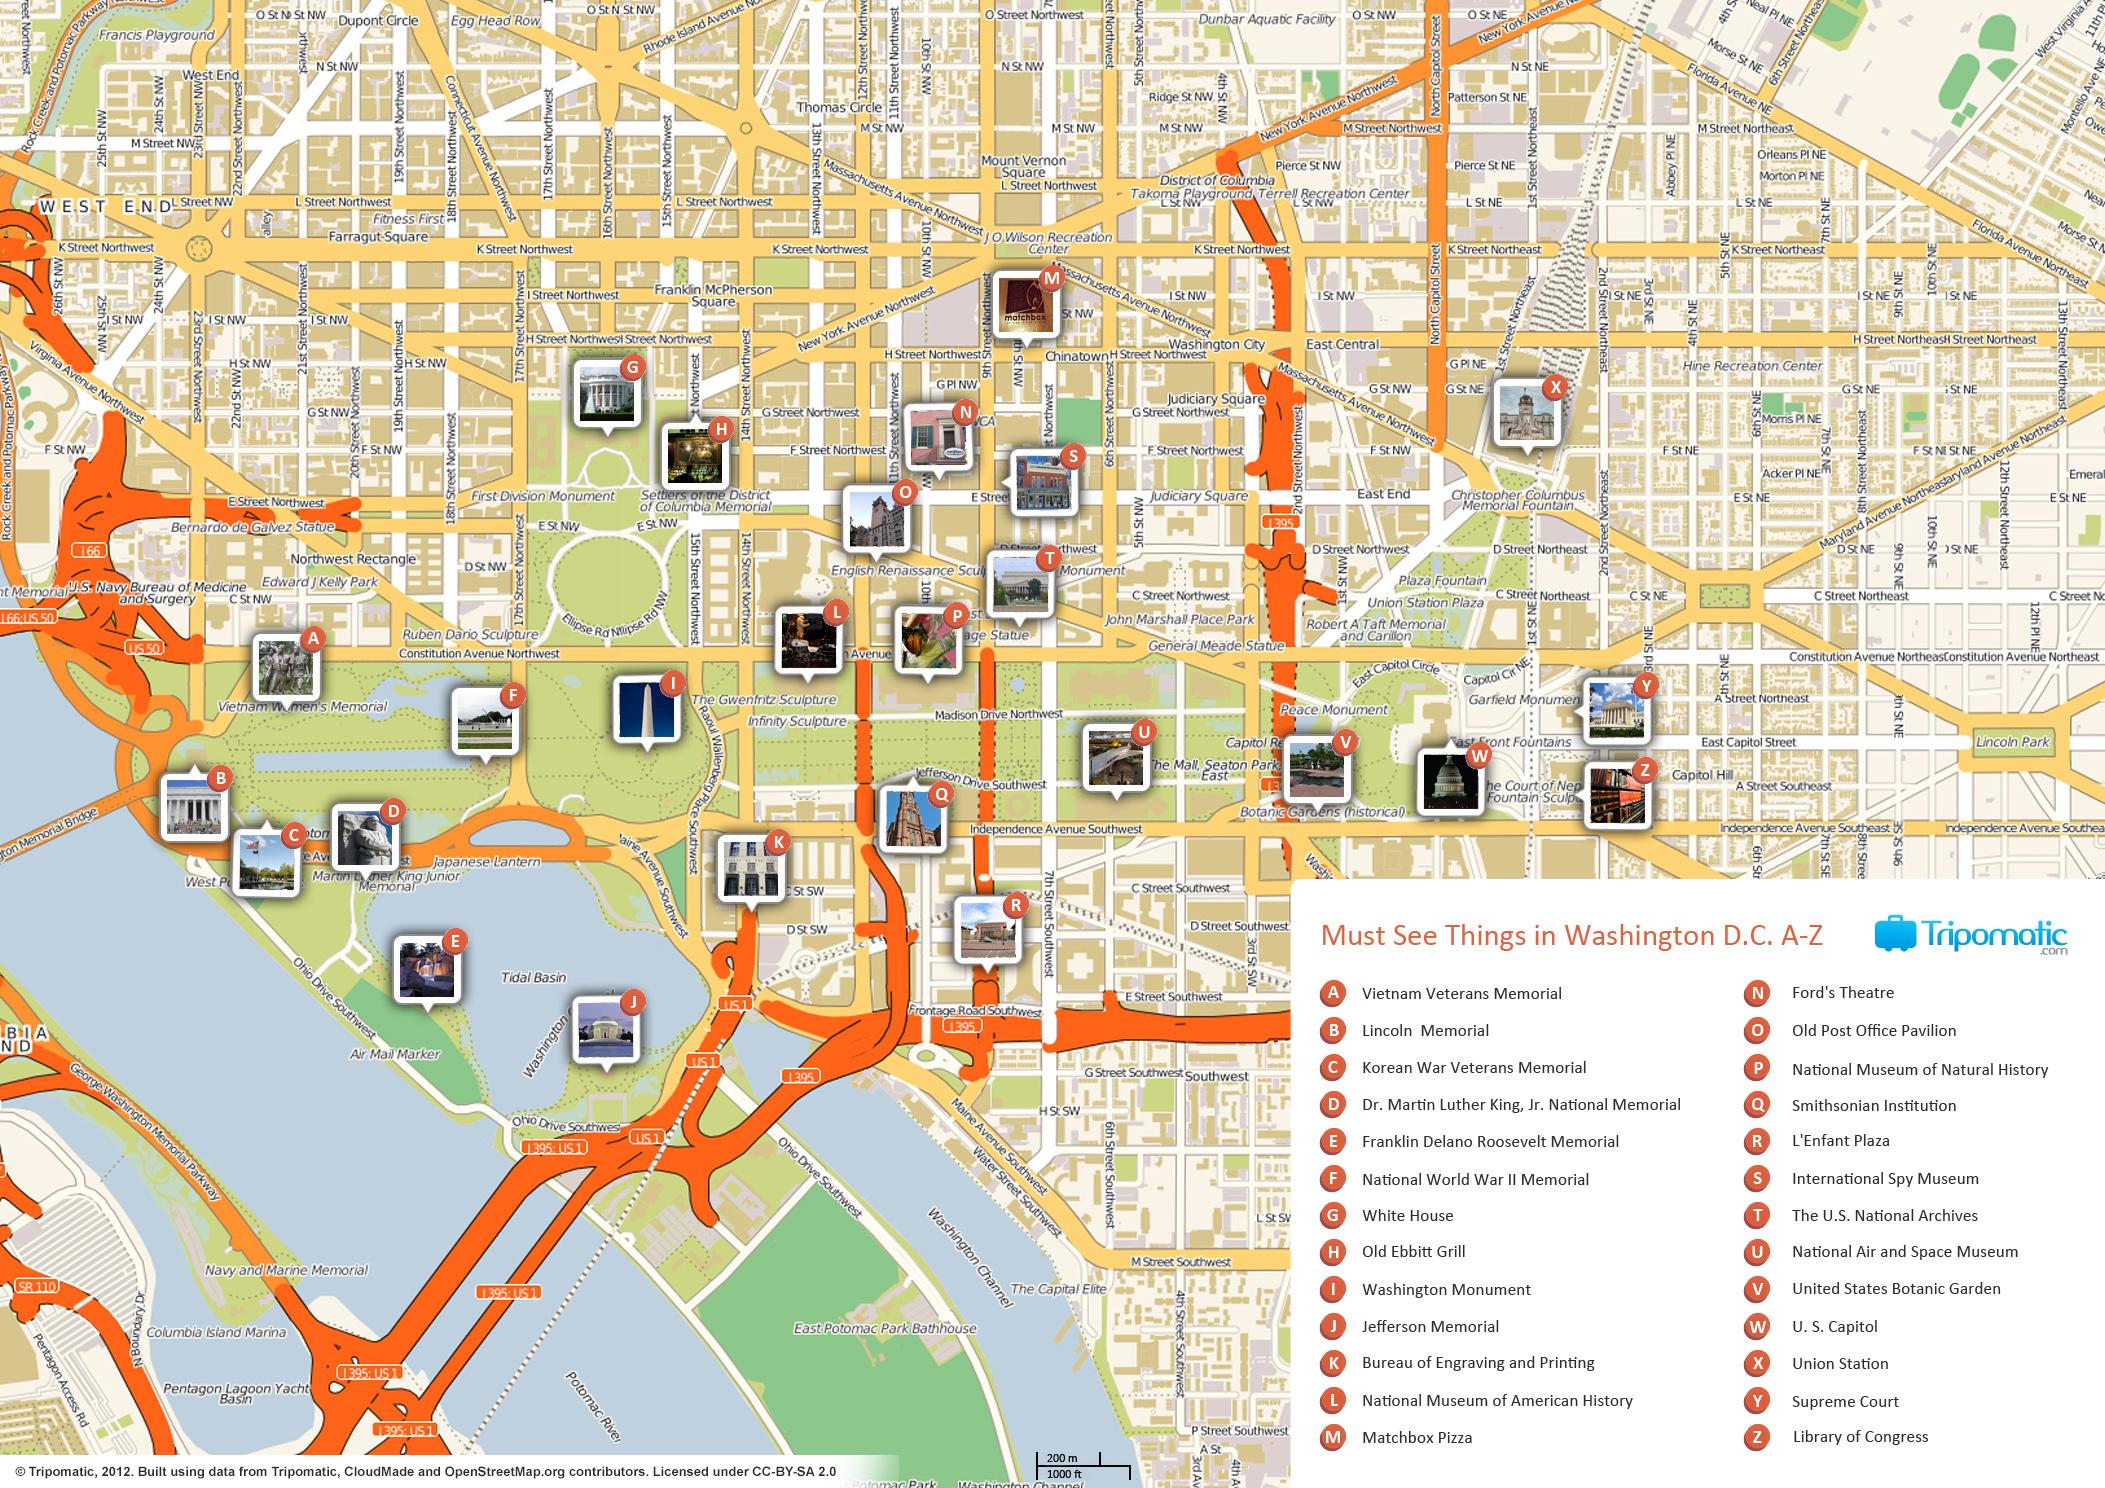 File:washington Dc Printable Tourist Attractions Map - Wikimedia - Washington Dc Tourist Map Printable